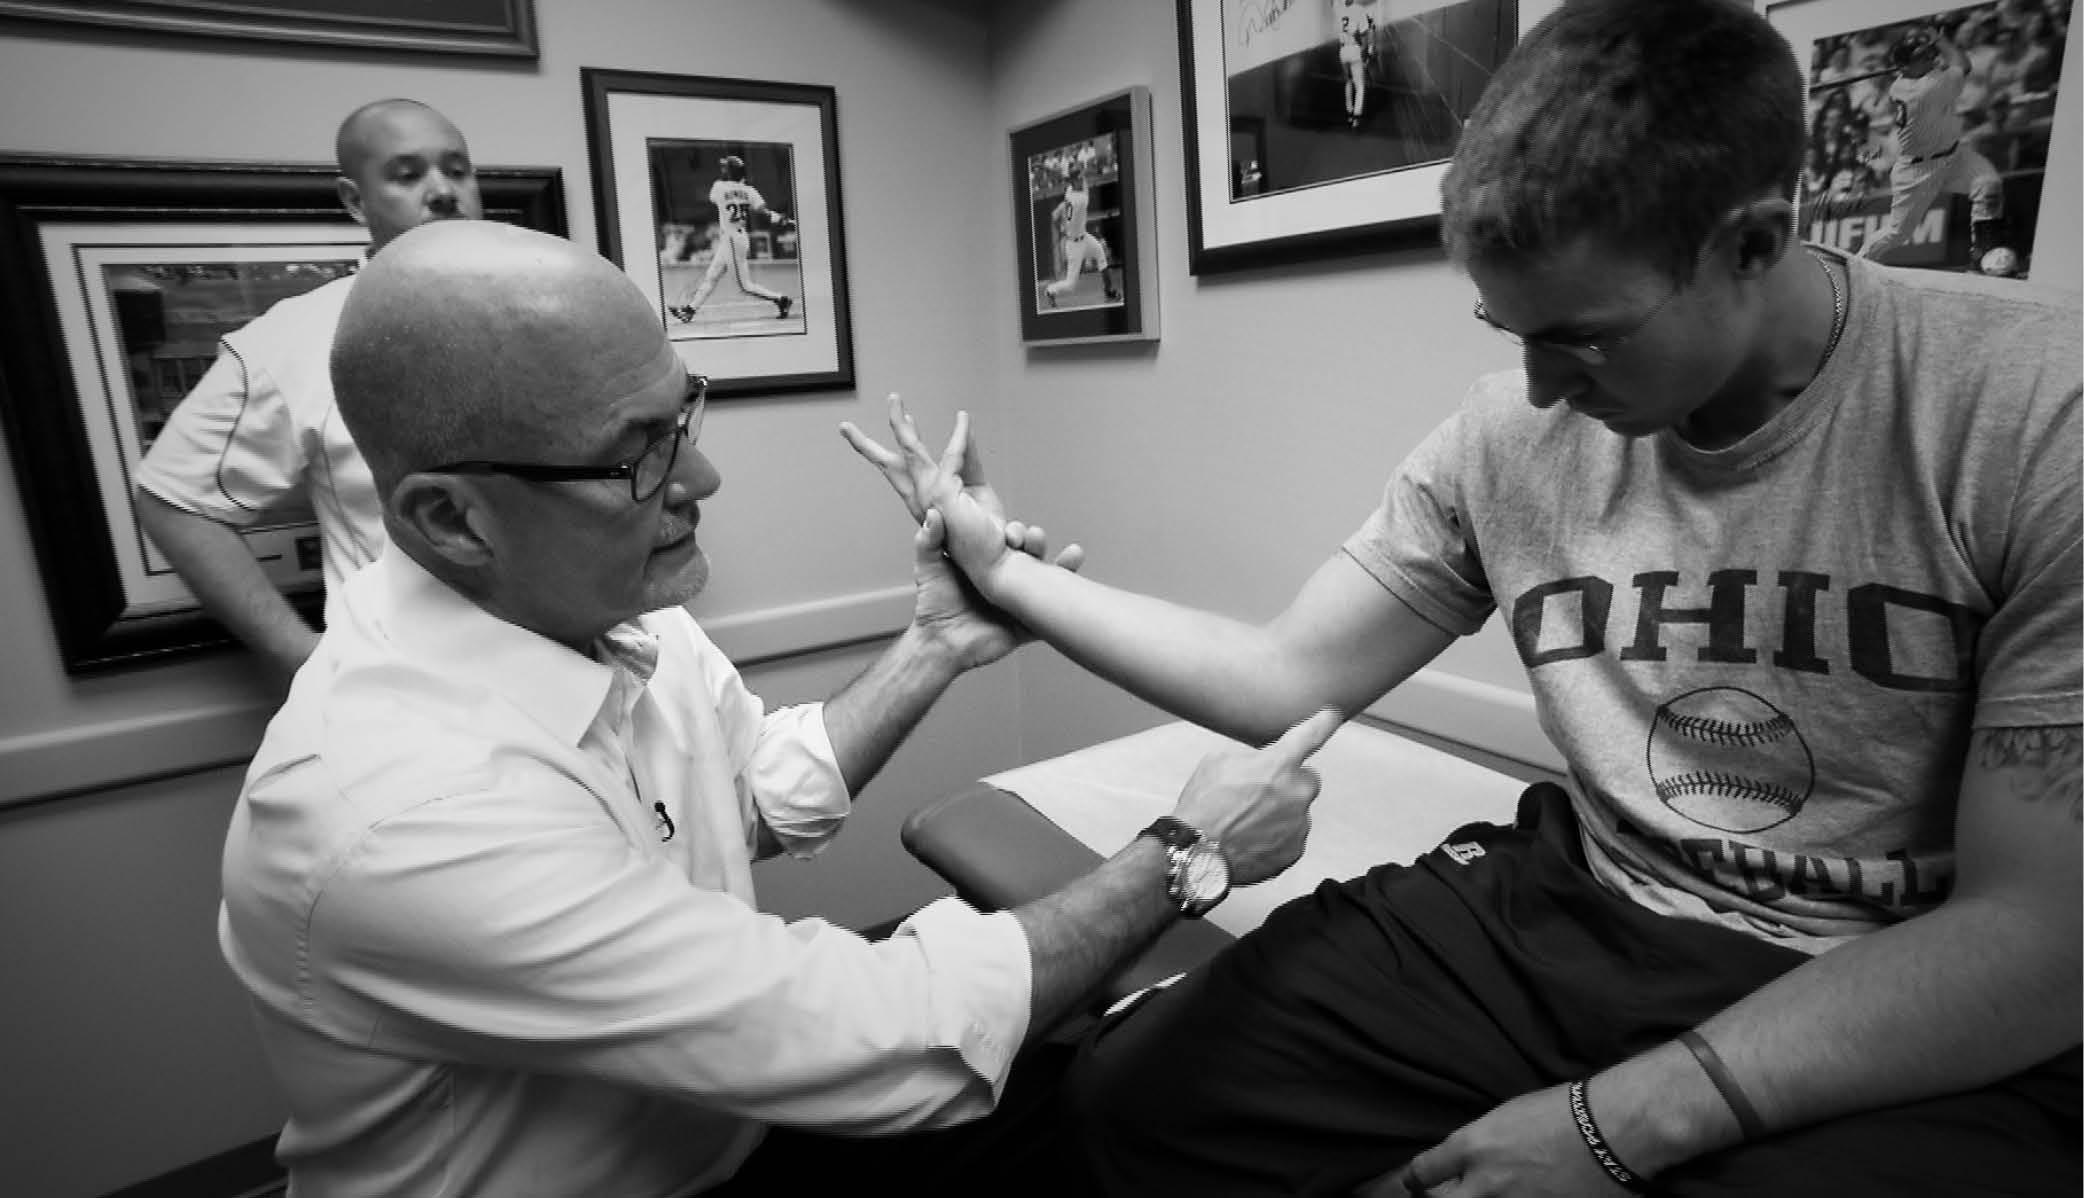 Kremchek treating patients at Summit Woods.